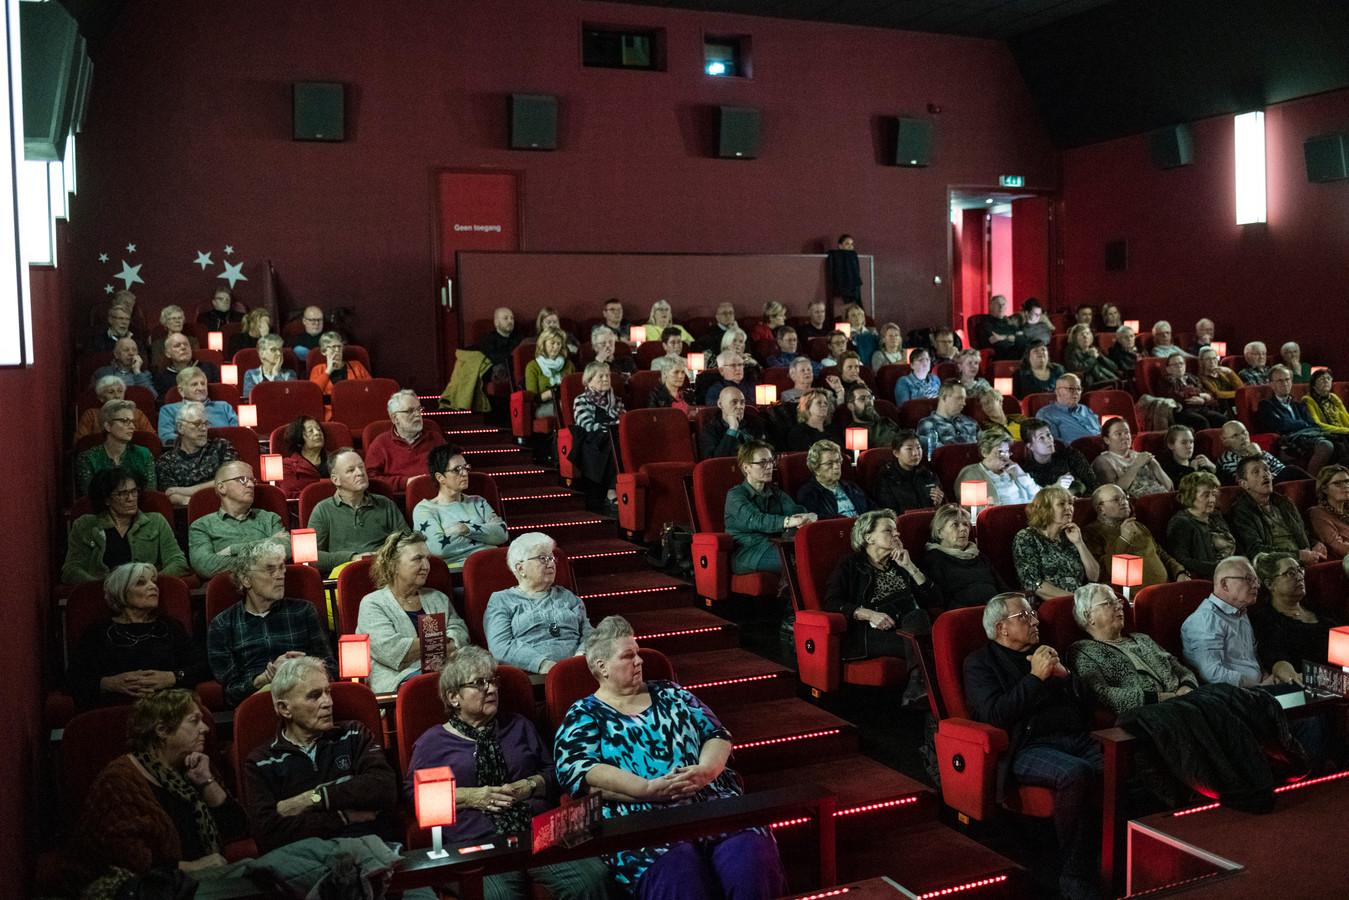 Drukte in de bioscoop in Twente, zoals hier in Almelo.